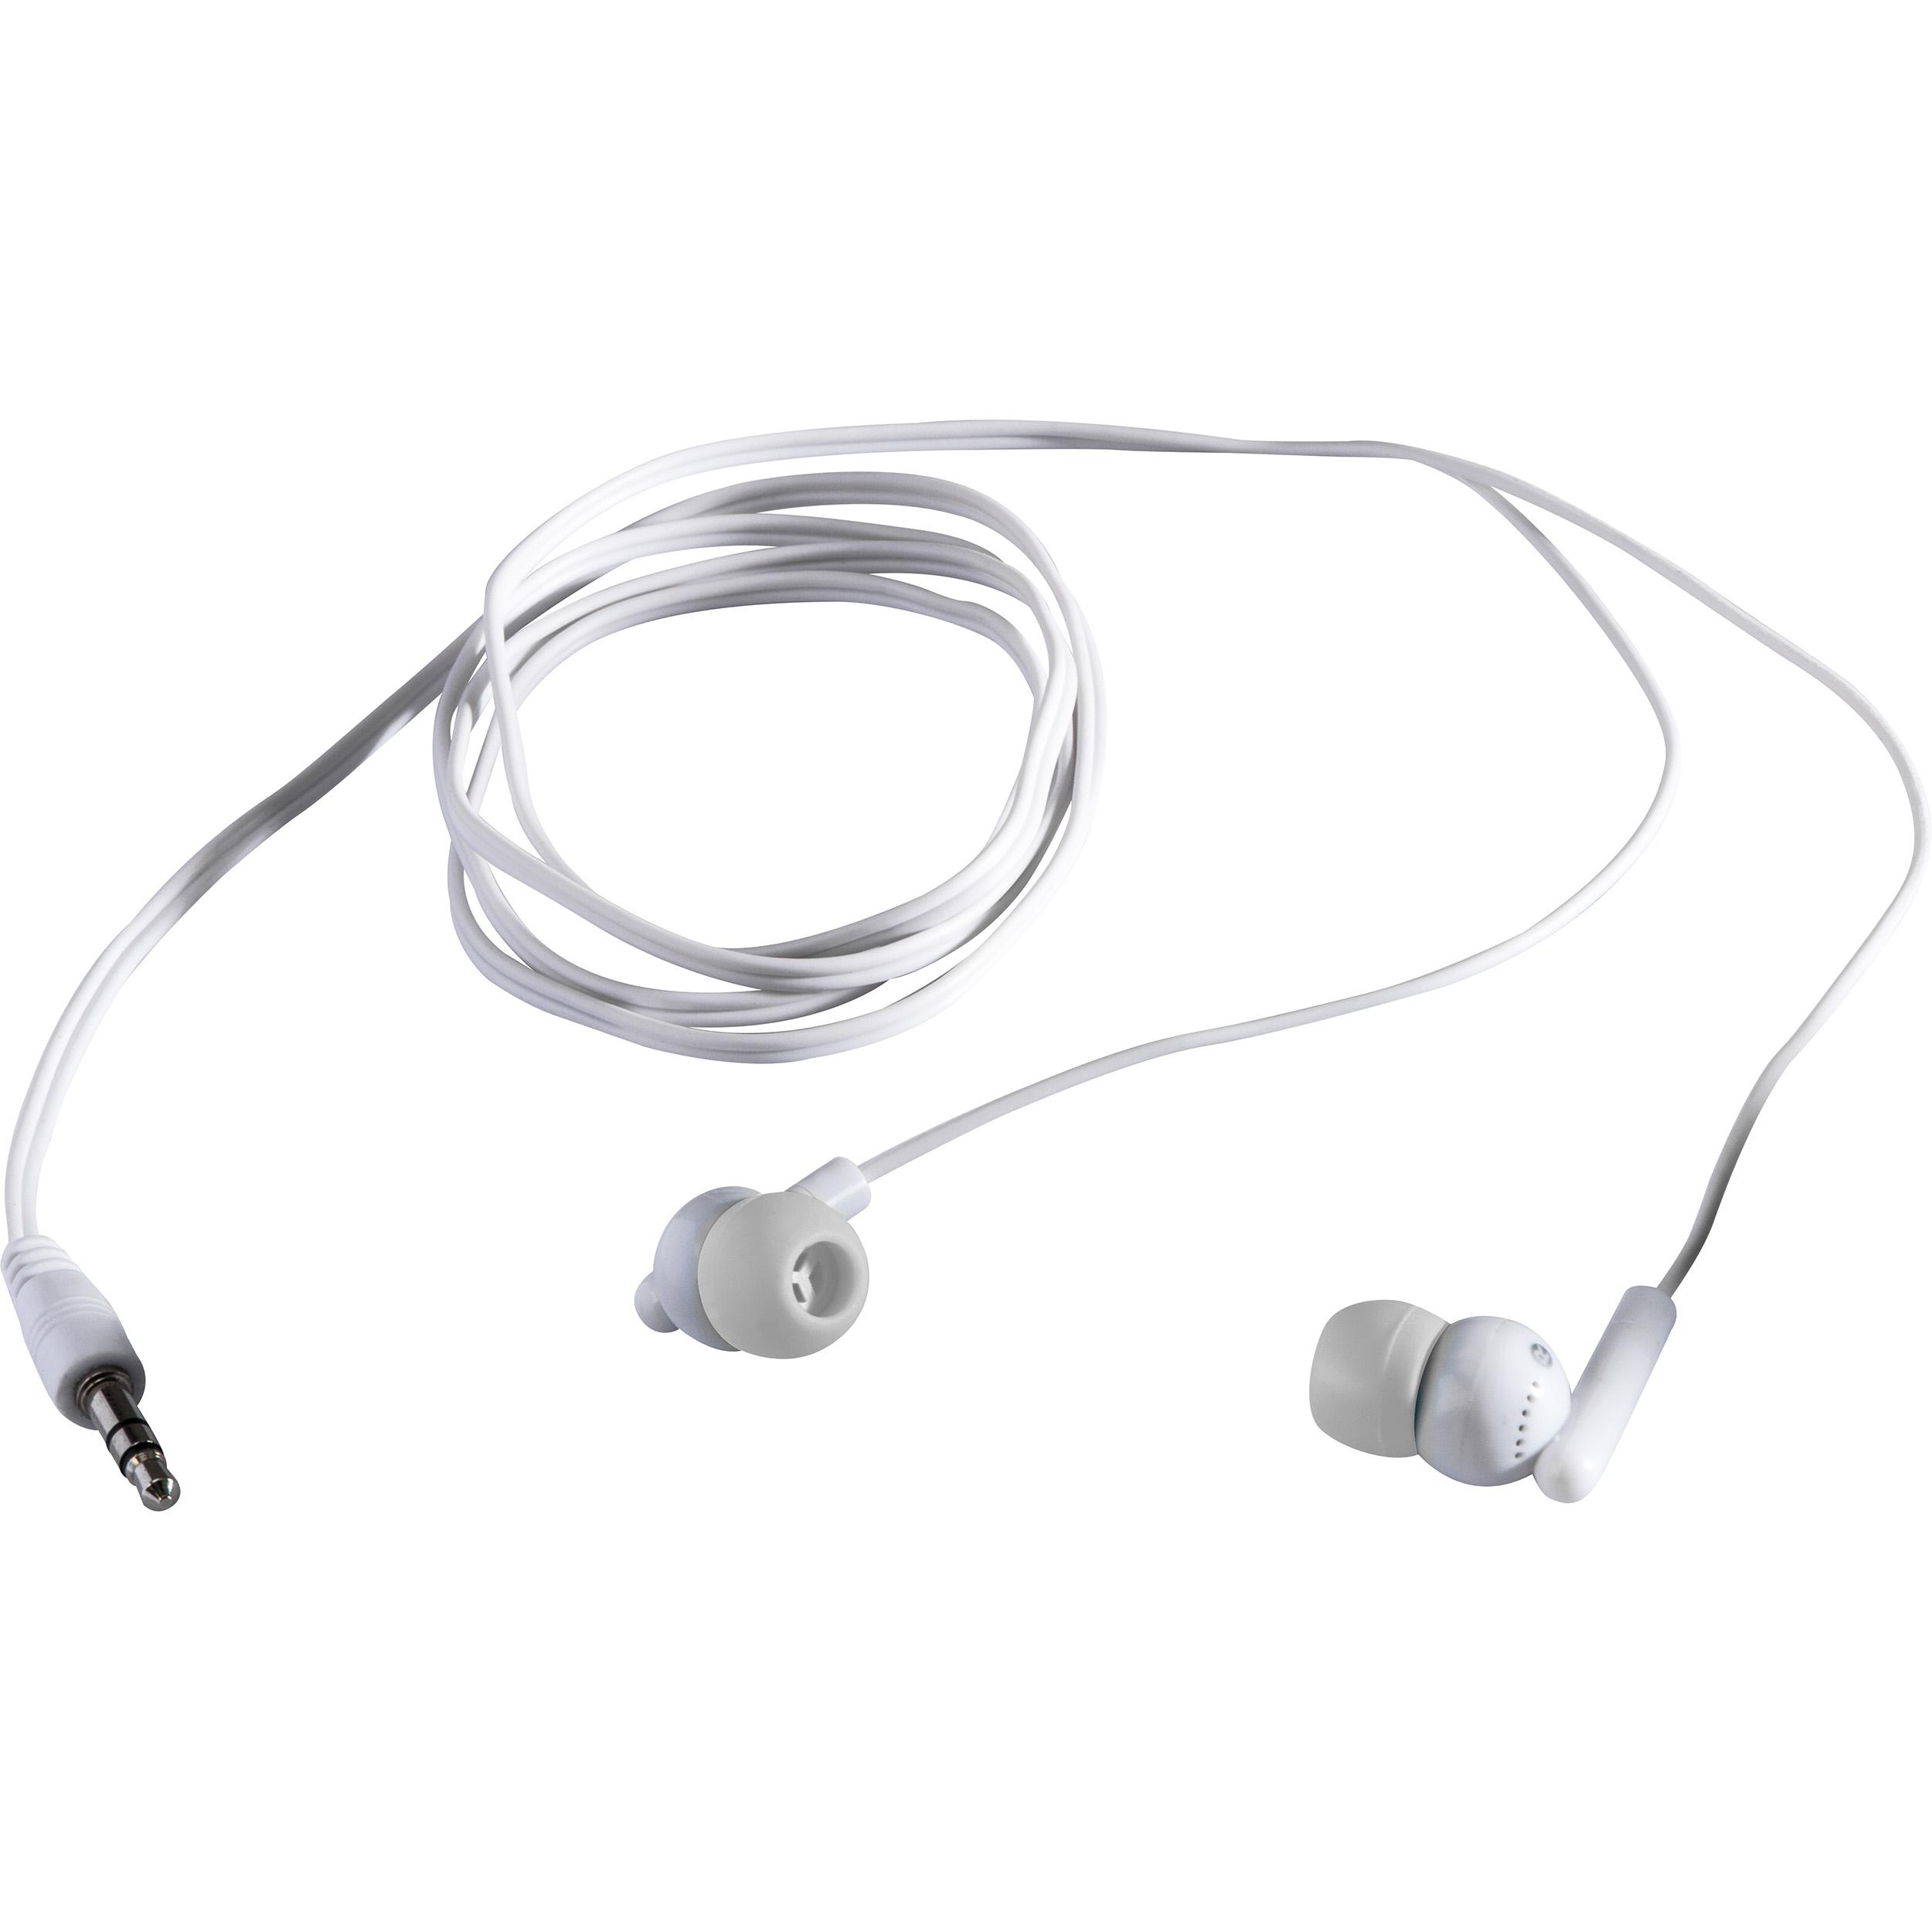 Kopfhörer für Smartphones